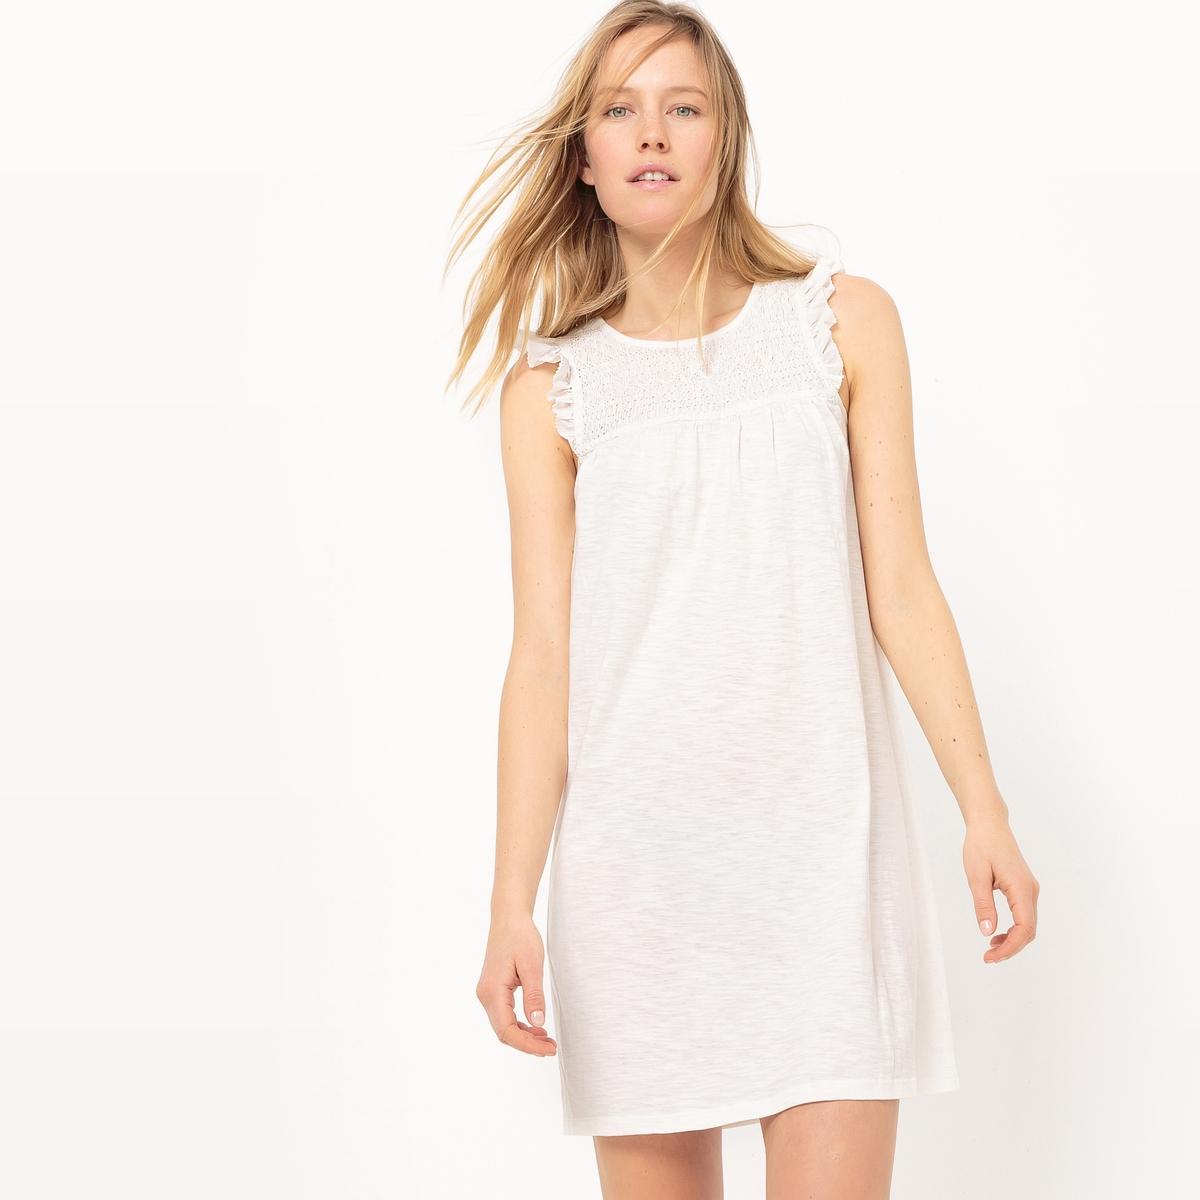 Платье с оборками, до колен, с воланами chapurin шелковое платье с оборками